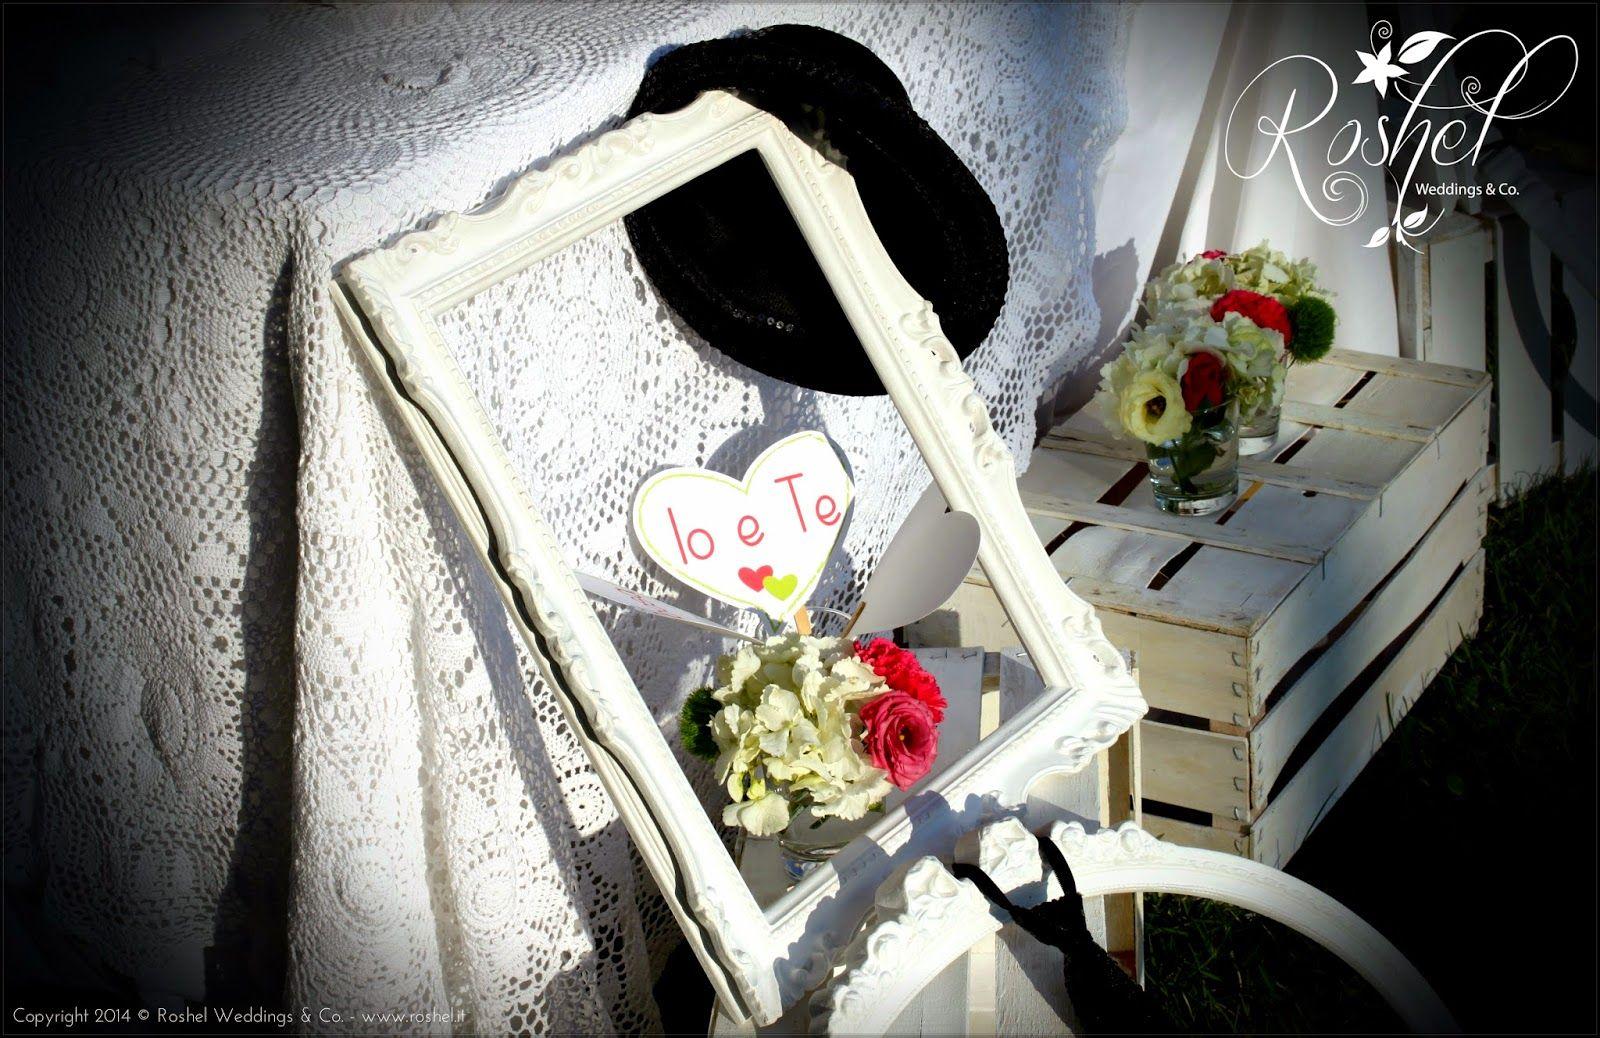 Wedding Photo Booth di Roshel Weddings & Co.  http://roshel-weddings-and-co.blogspot.it/2015/02/l-del-photo-booth-facce-da-matrimonio.html